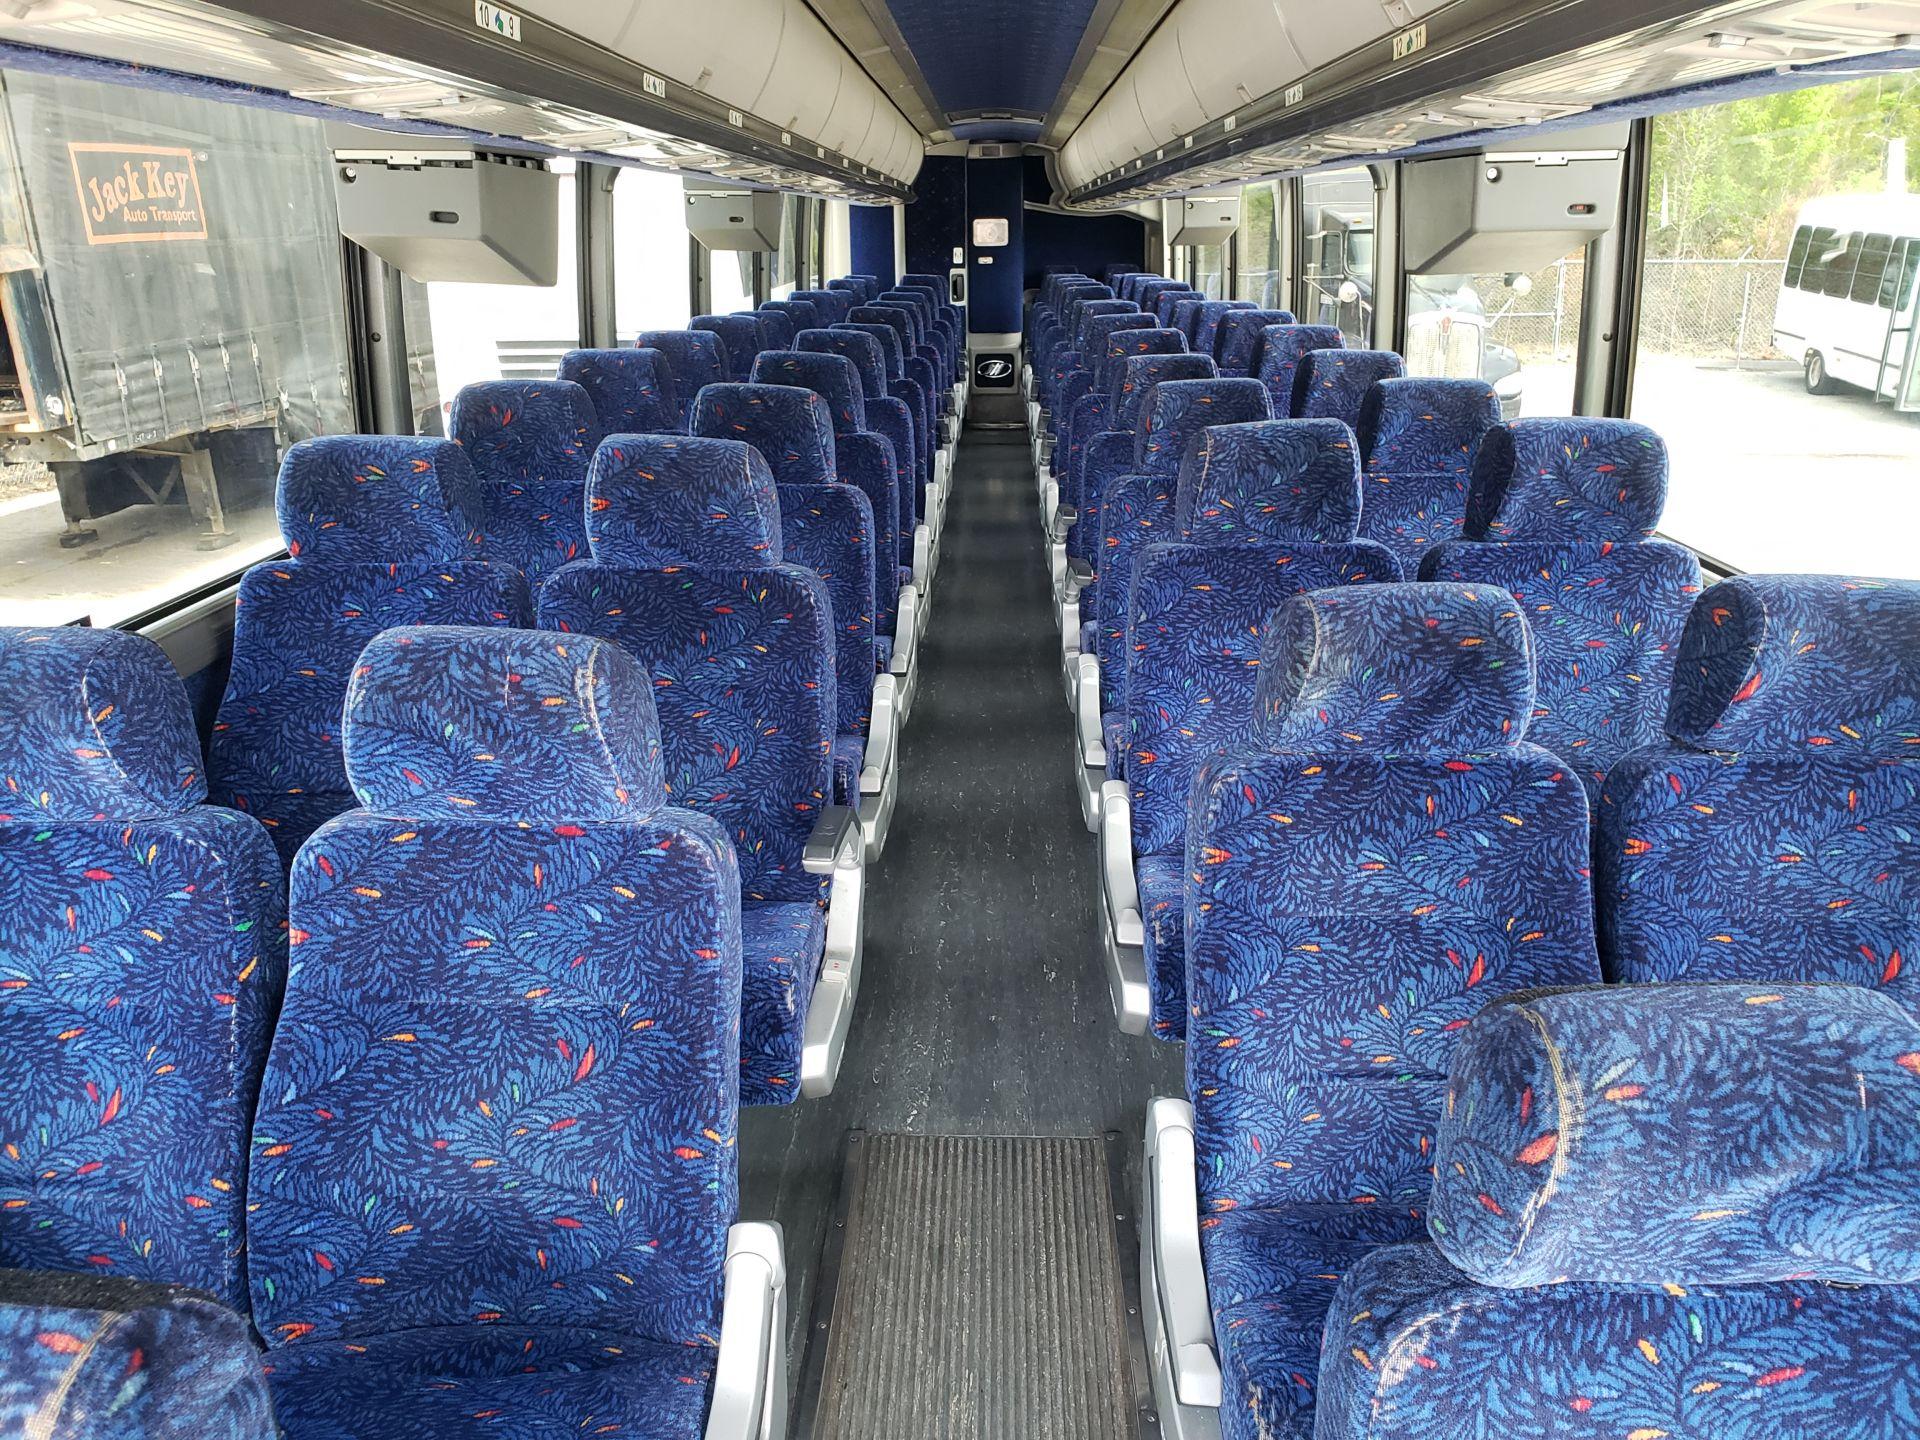 2005 MCI J4500 56-Pass Kneeling Coach Bus - Image 9 of 18